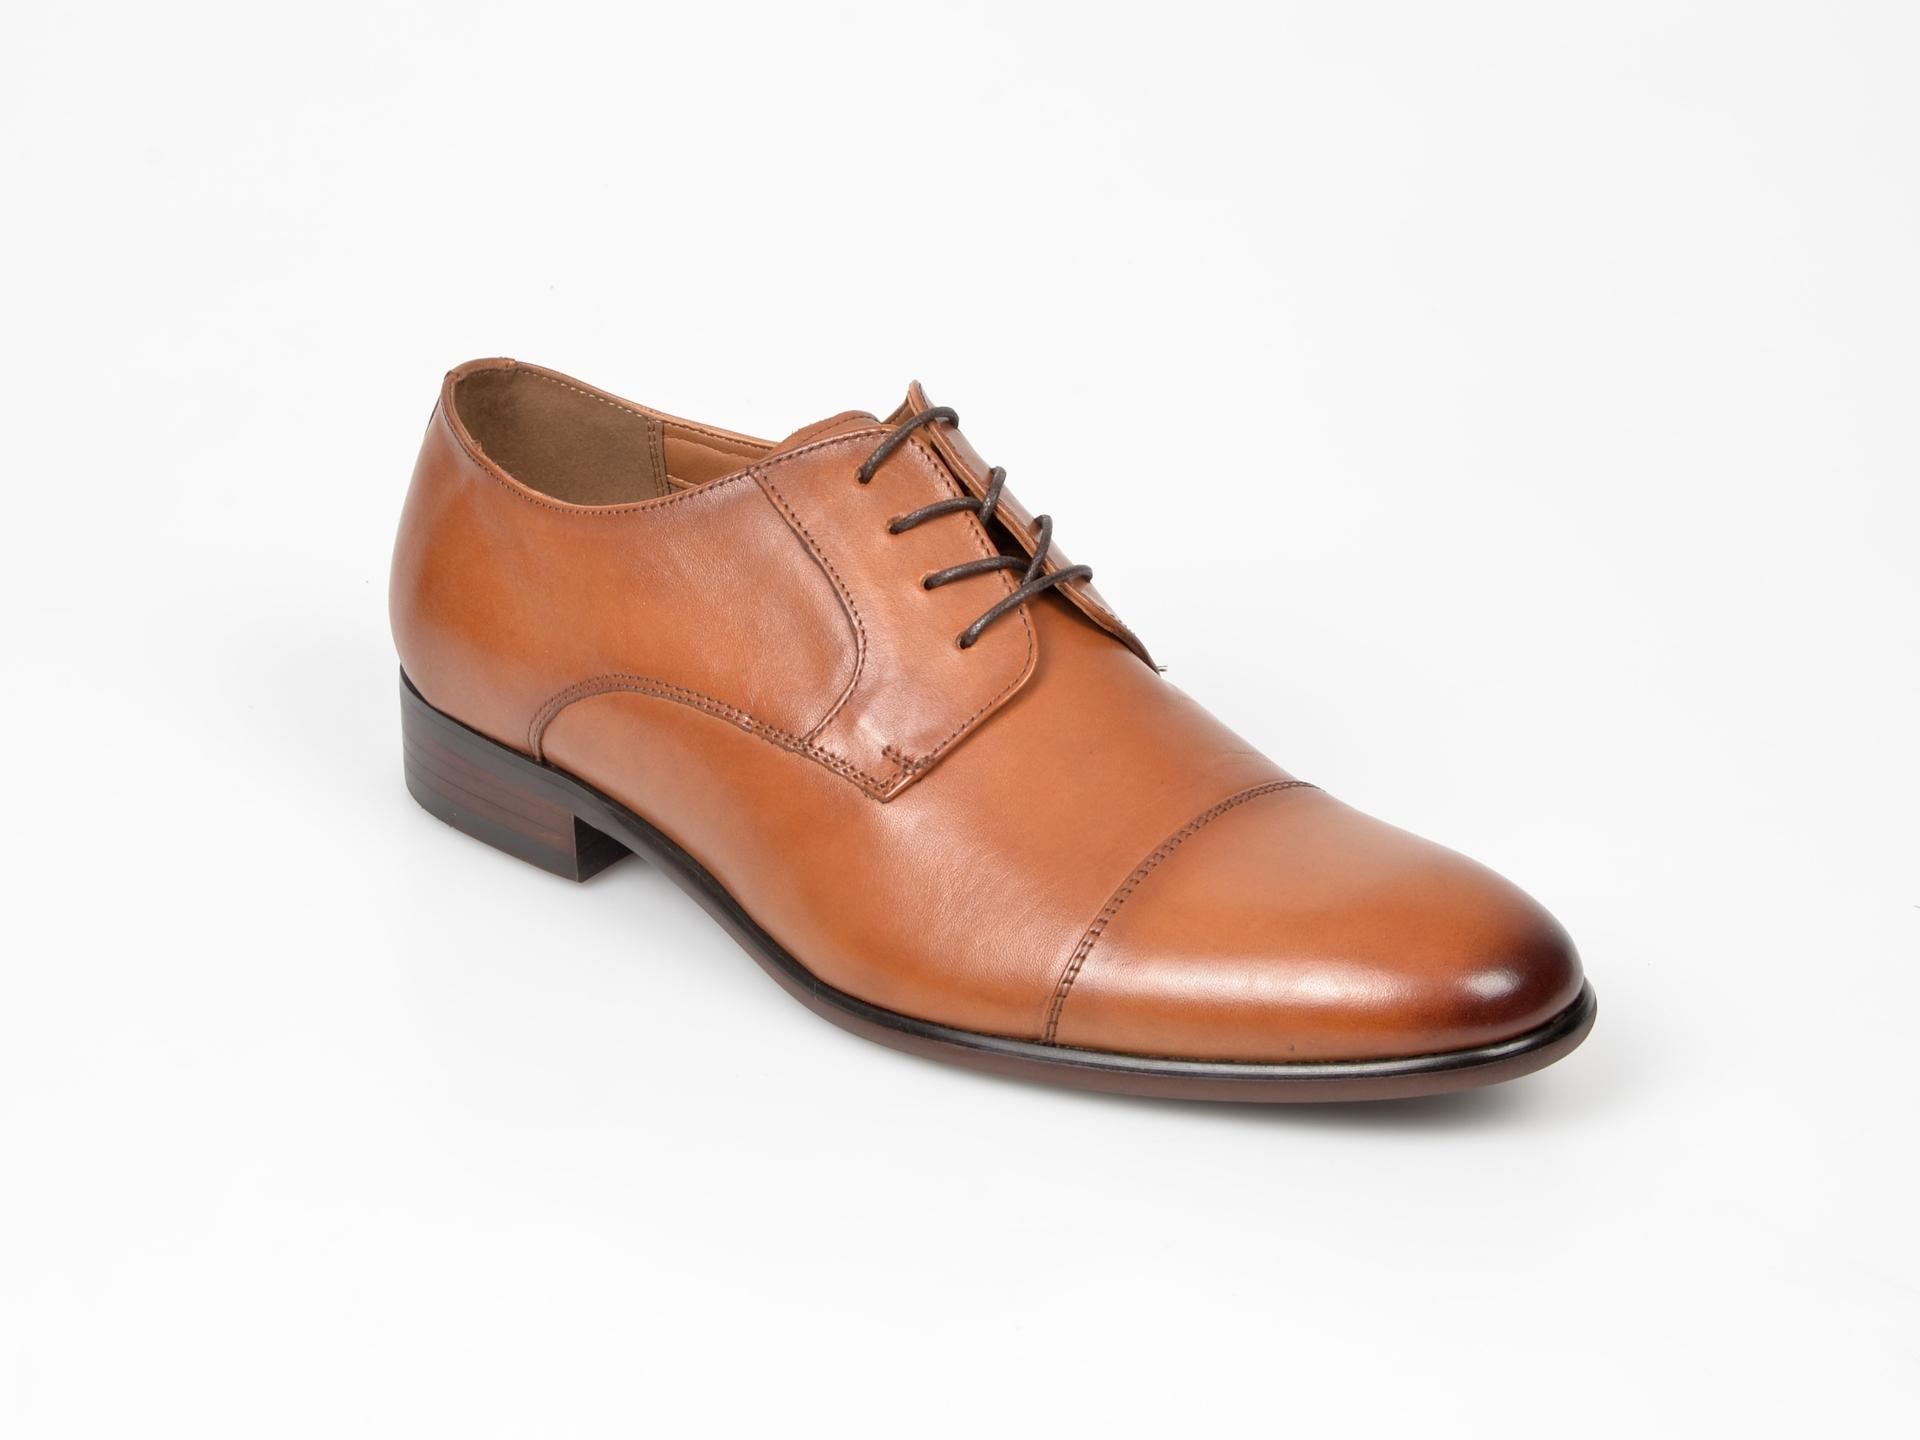 Pantofi ALDO maro, Galerrang-r, din piele naturala imagine